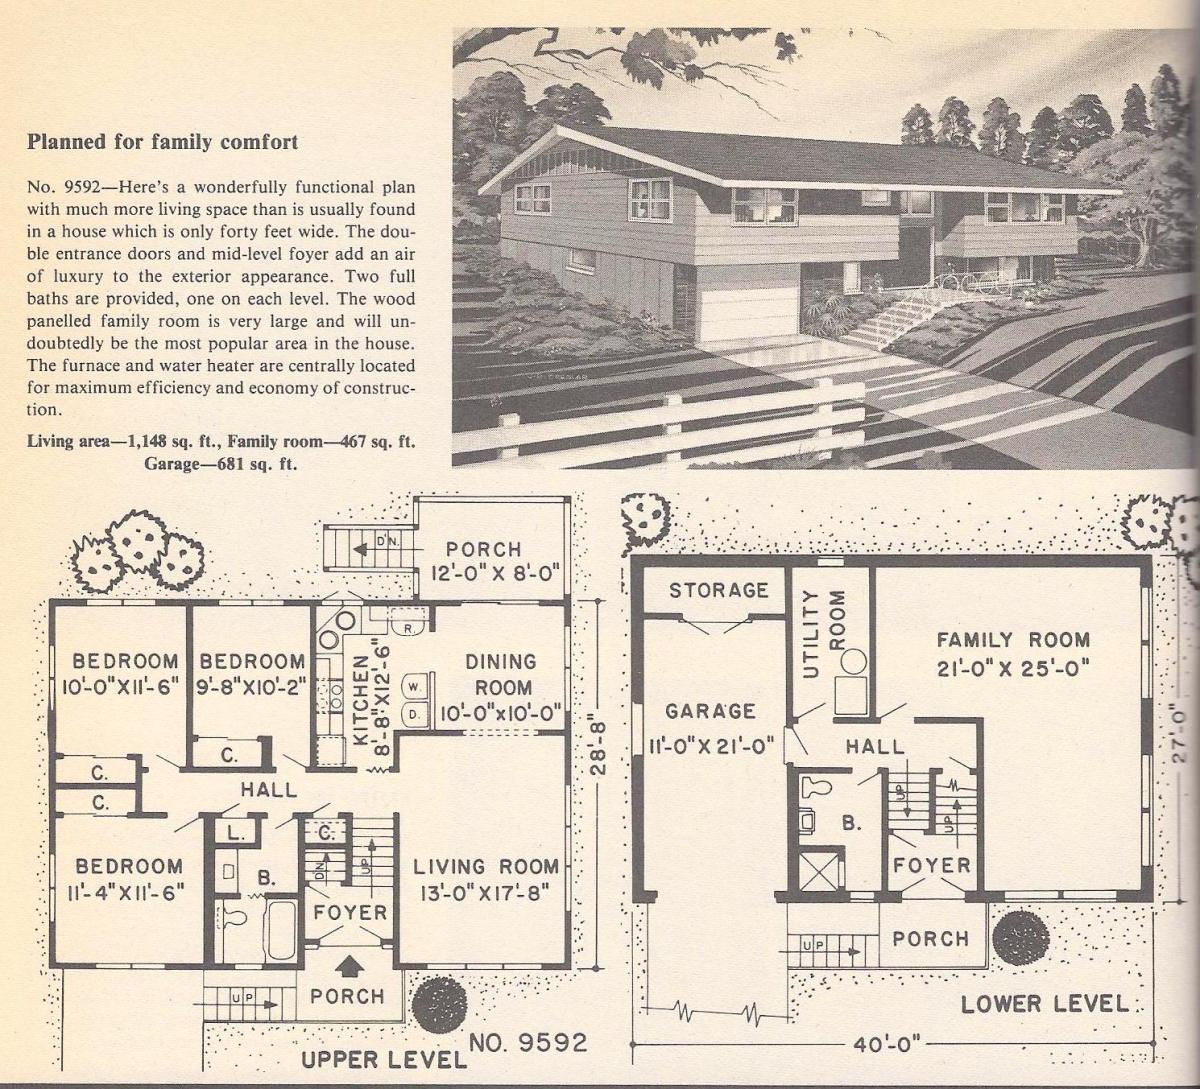 Vintage House Plans, Family Comfort